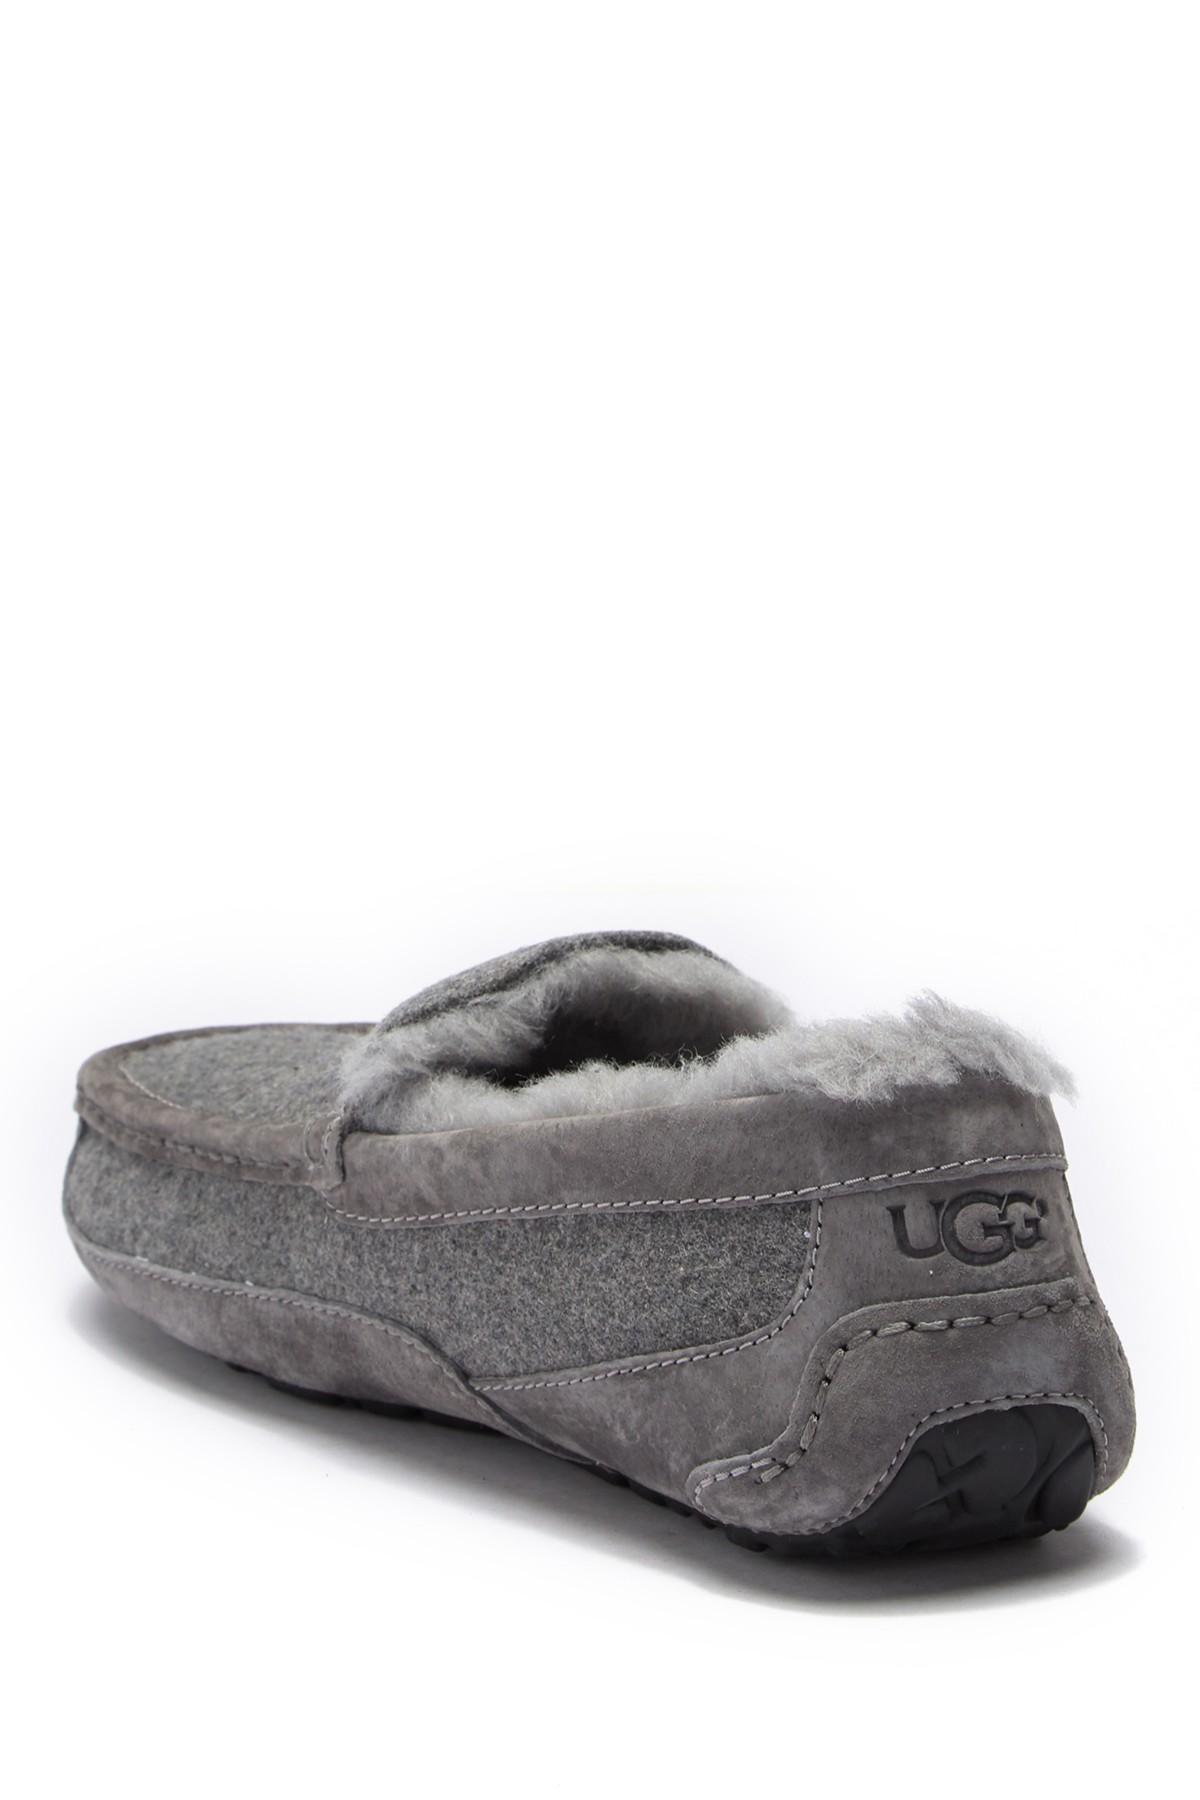 aa10d6918 Lyst - UGG Ascot Uggpure(tm) Slipper in Gray for Men